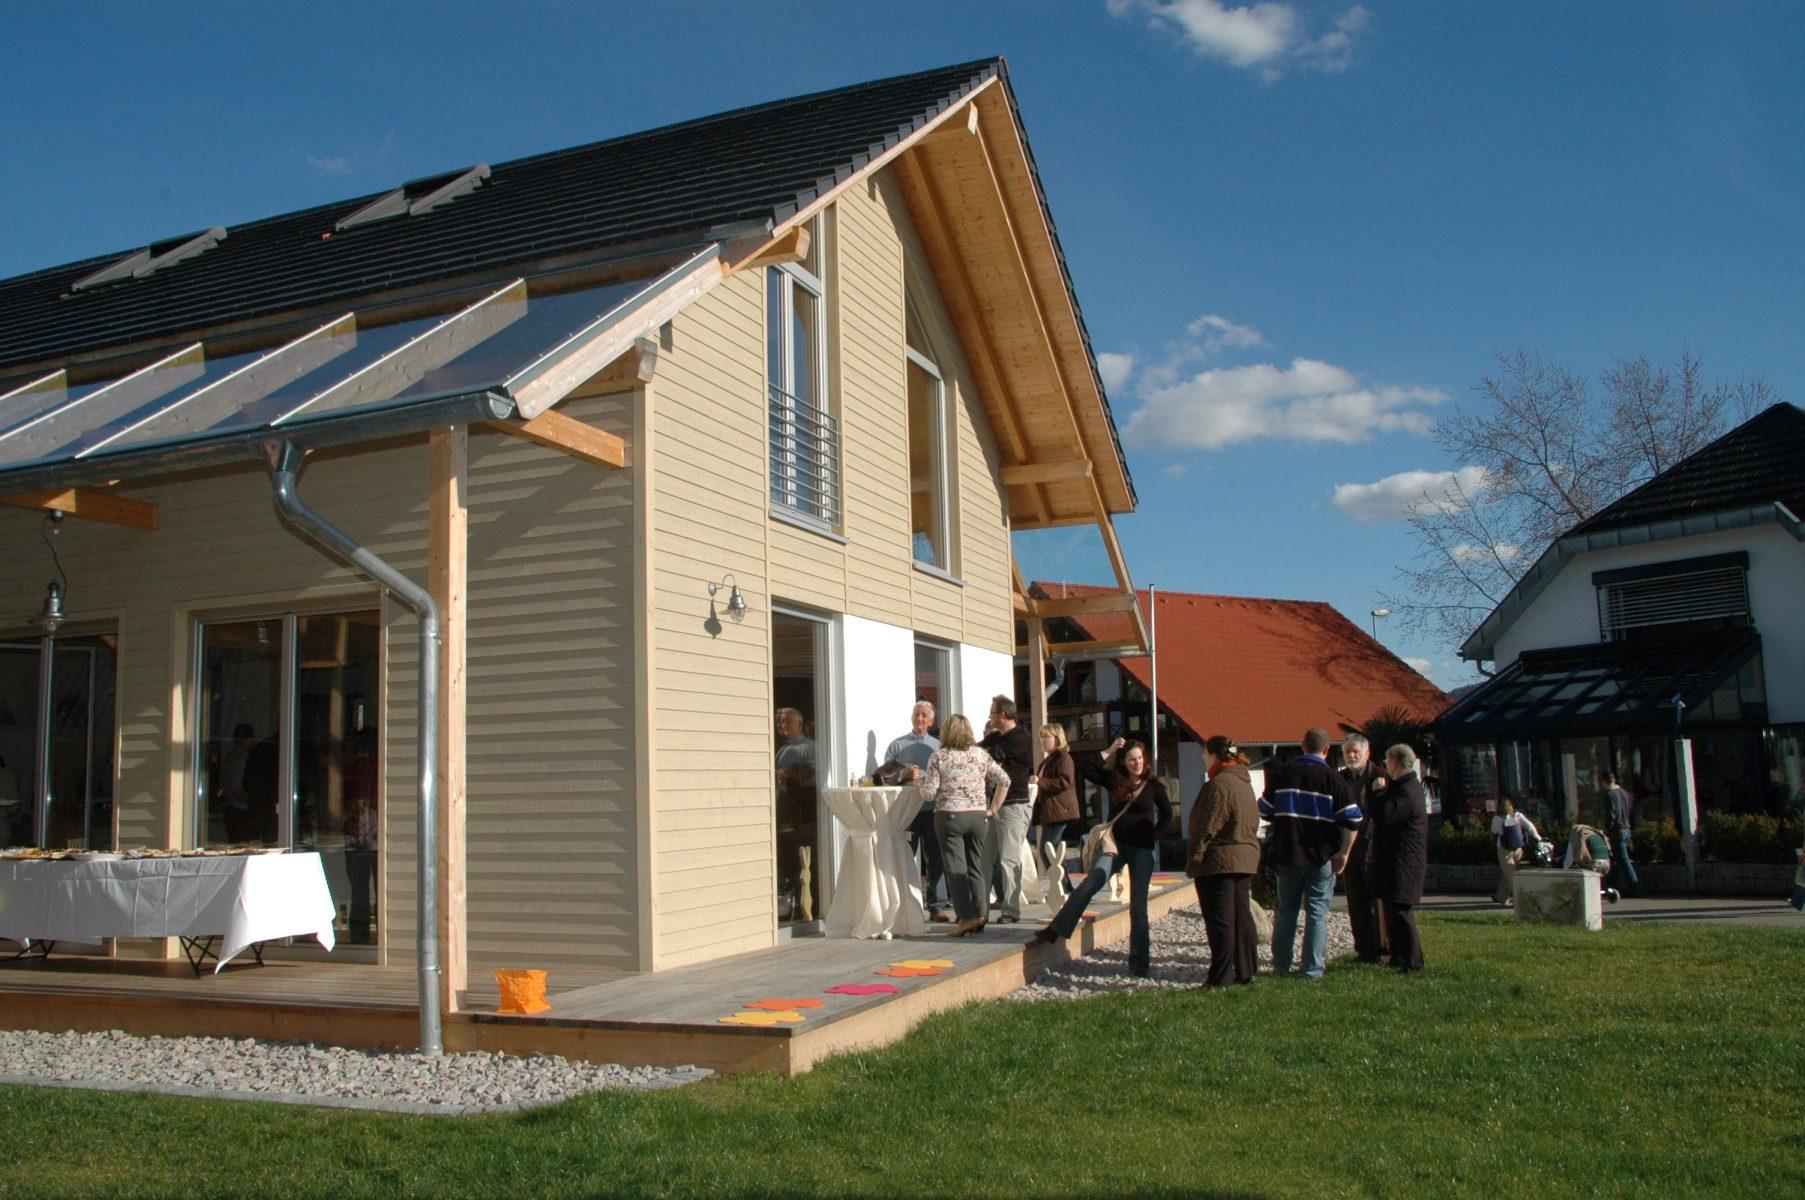 Eröffnung Musterhaus Fellbach in der Ausstellung Eigenheim & Garten bei Stuttgart